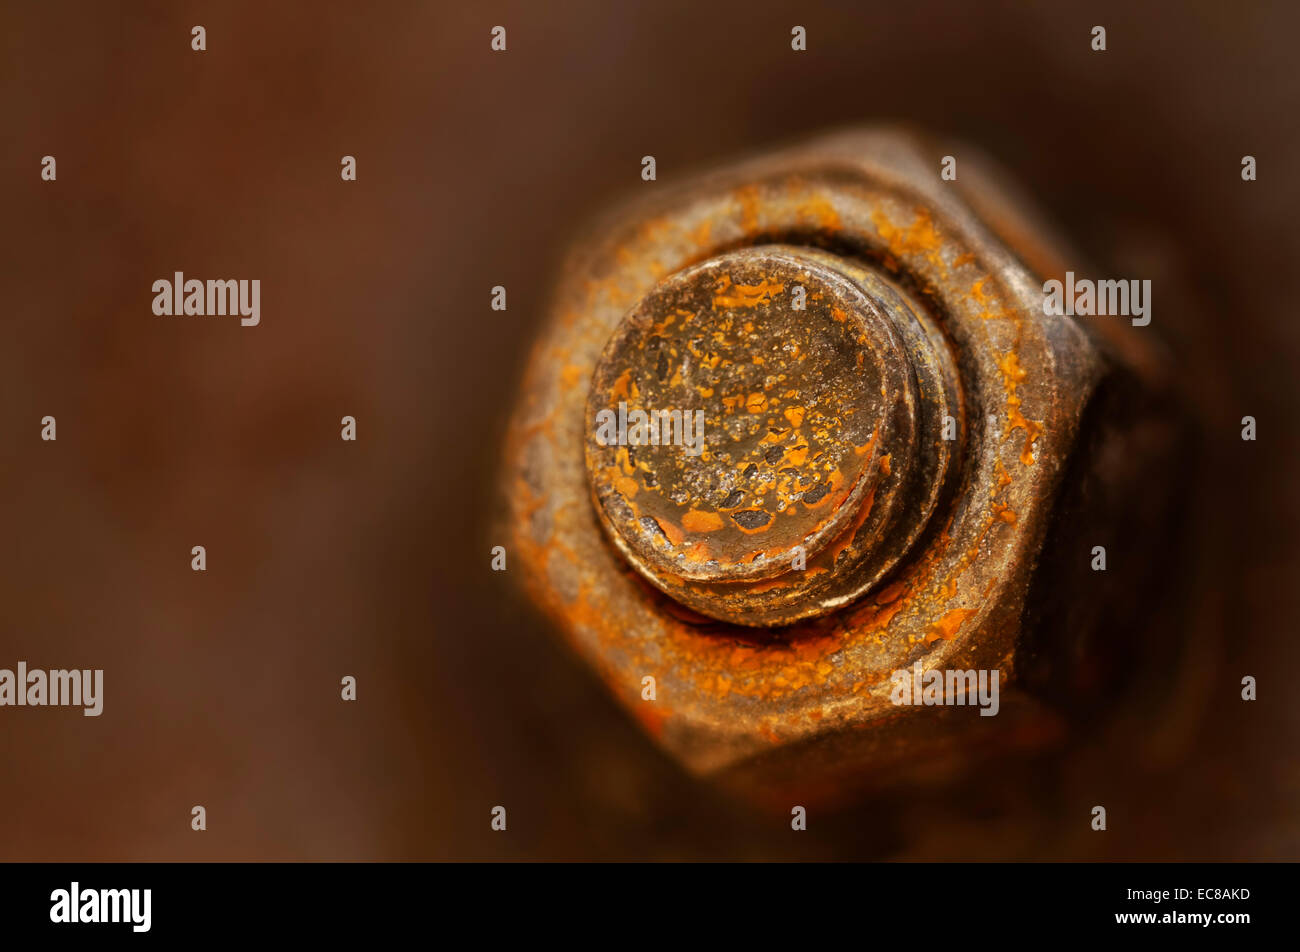 Tornillo y tuerca oxidada Imagen De Stock